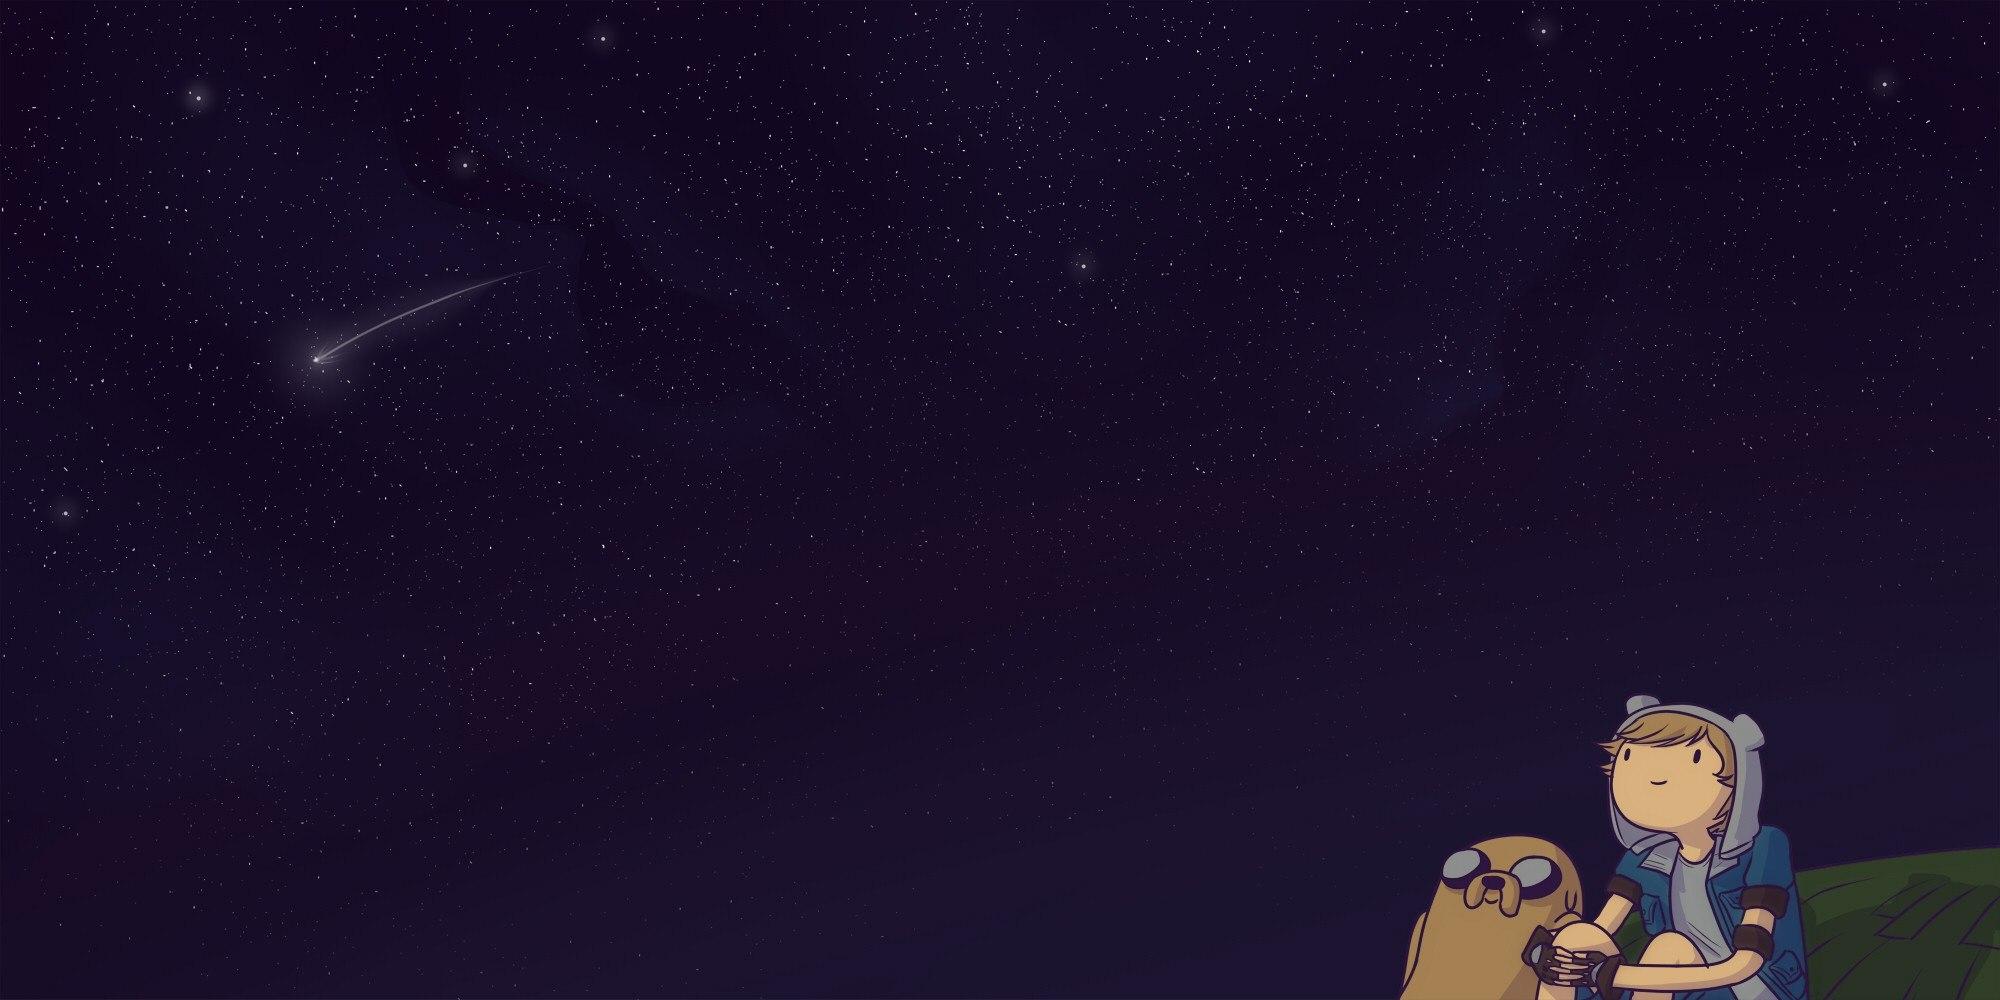 Adventure time wallpaper 2000x1000 HQ WALLPAPER   46476 2000x1000